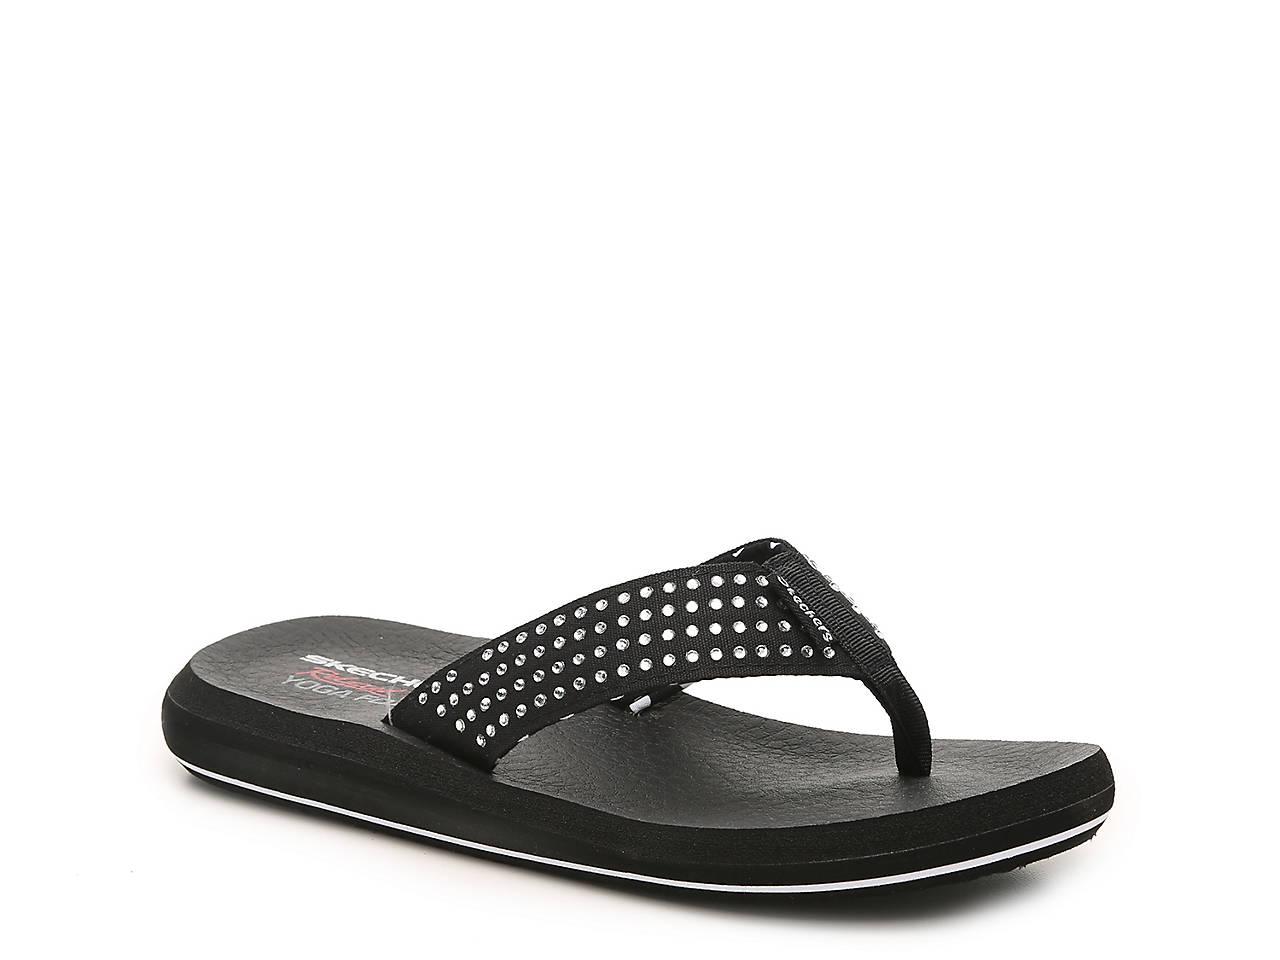 3df69ad4cb5a Skechers Cali Asana New Age Flip Flop Women s Shoes